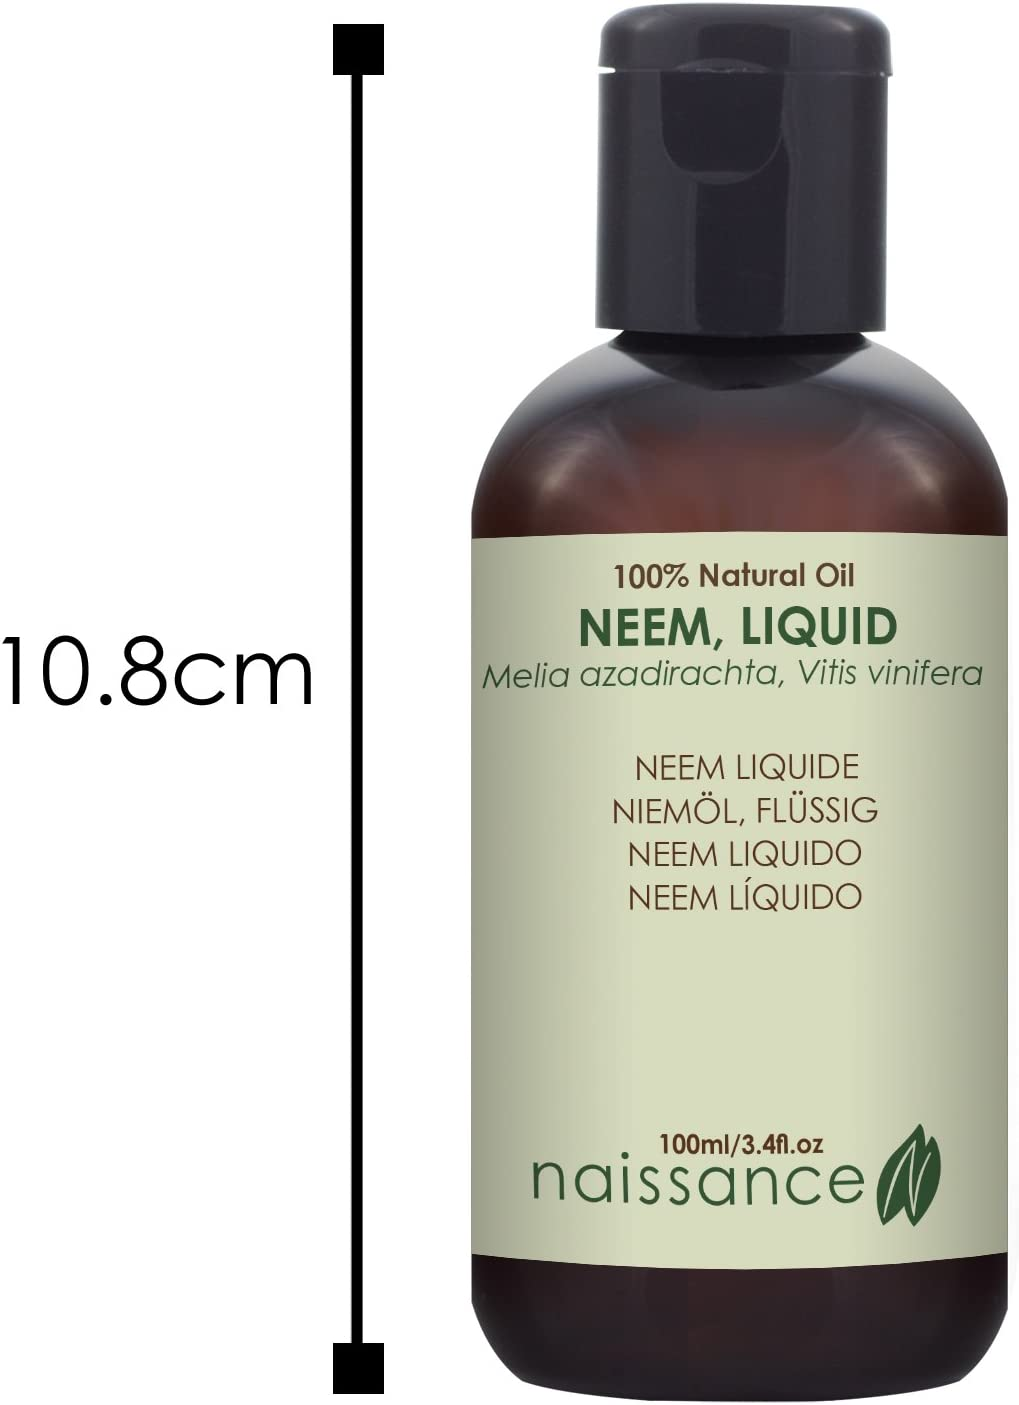 Naissance Neem Líquido - Aceite Vegetal Prensado en Frío 100% Puro - 100ml